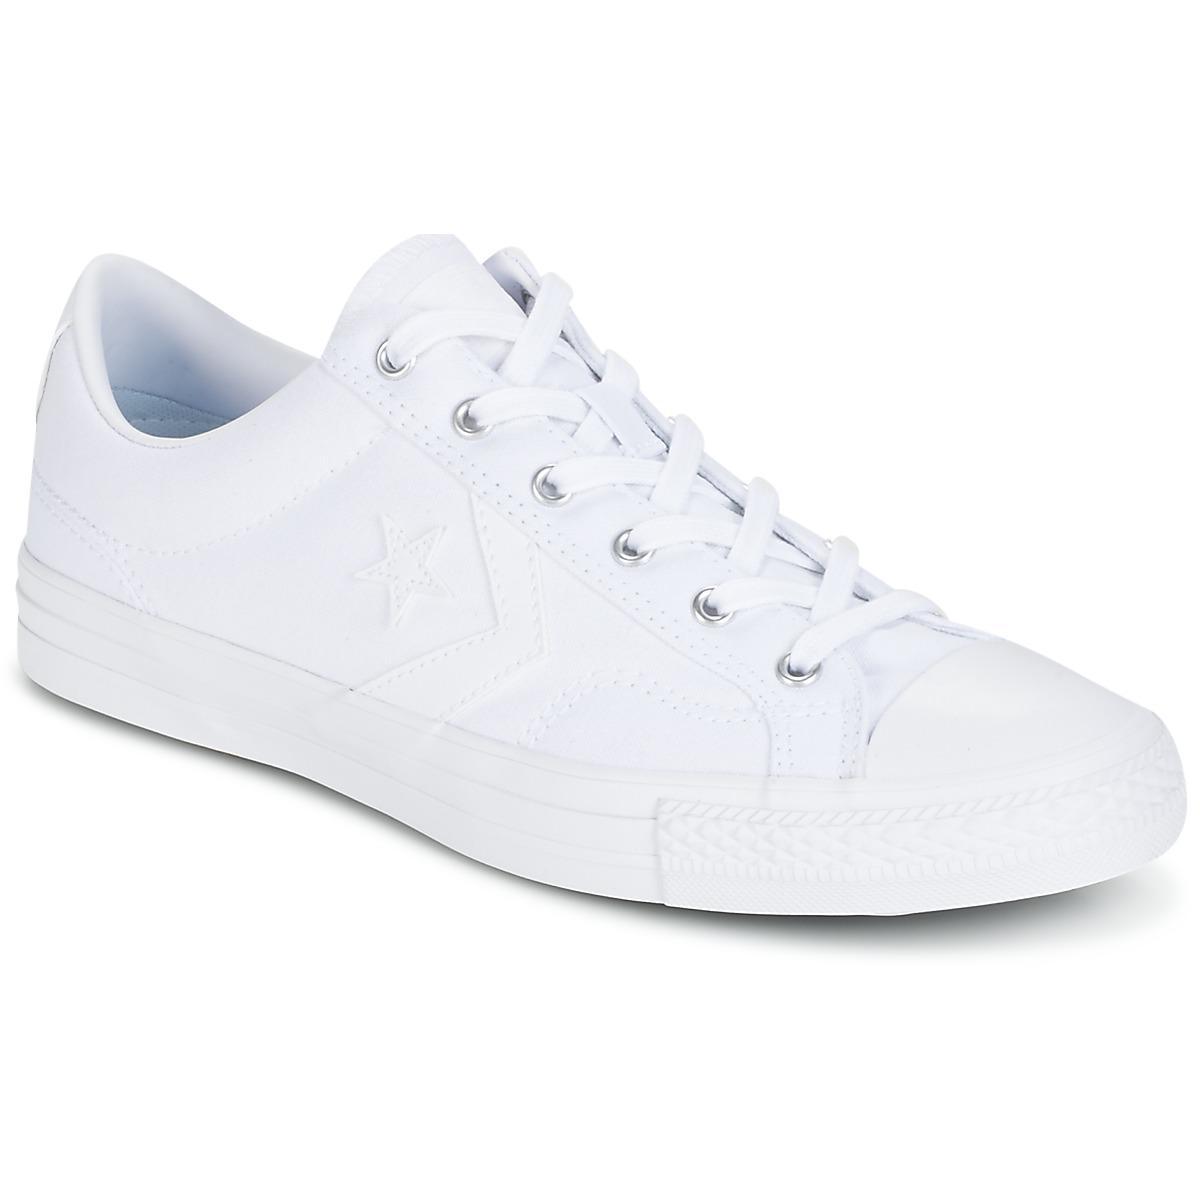 Converse. Star Player Canvas With Gum Ox White white white Men s ... e38cc9a81